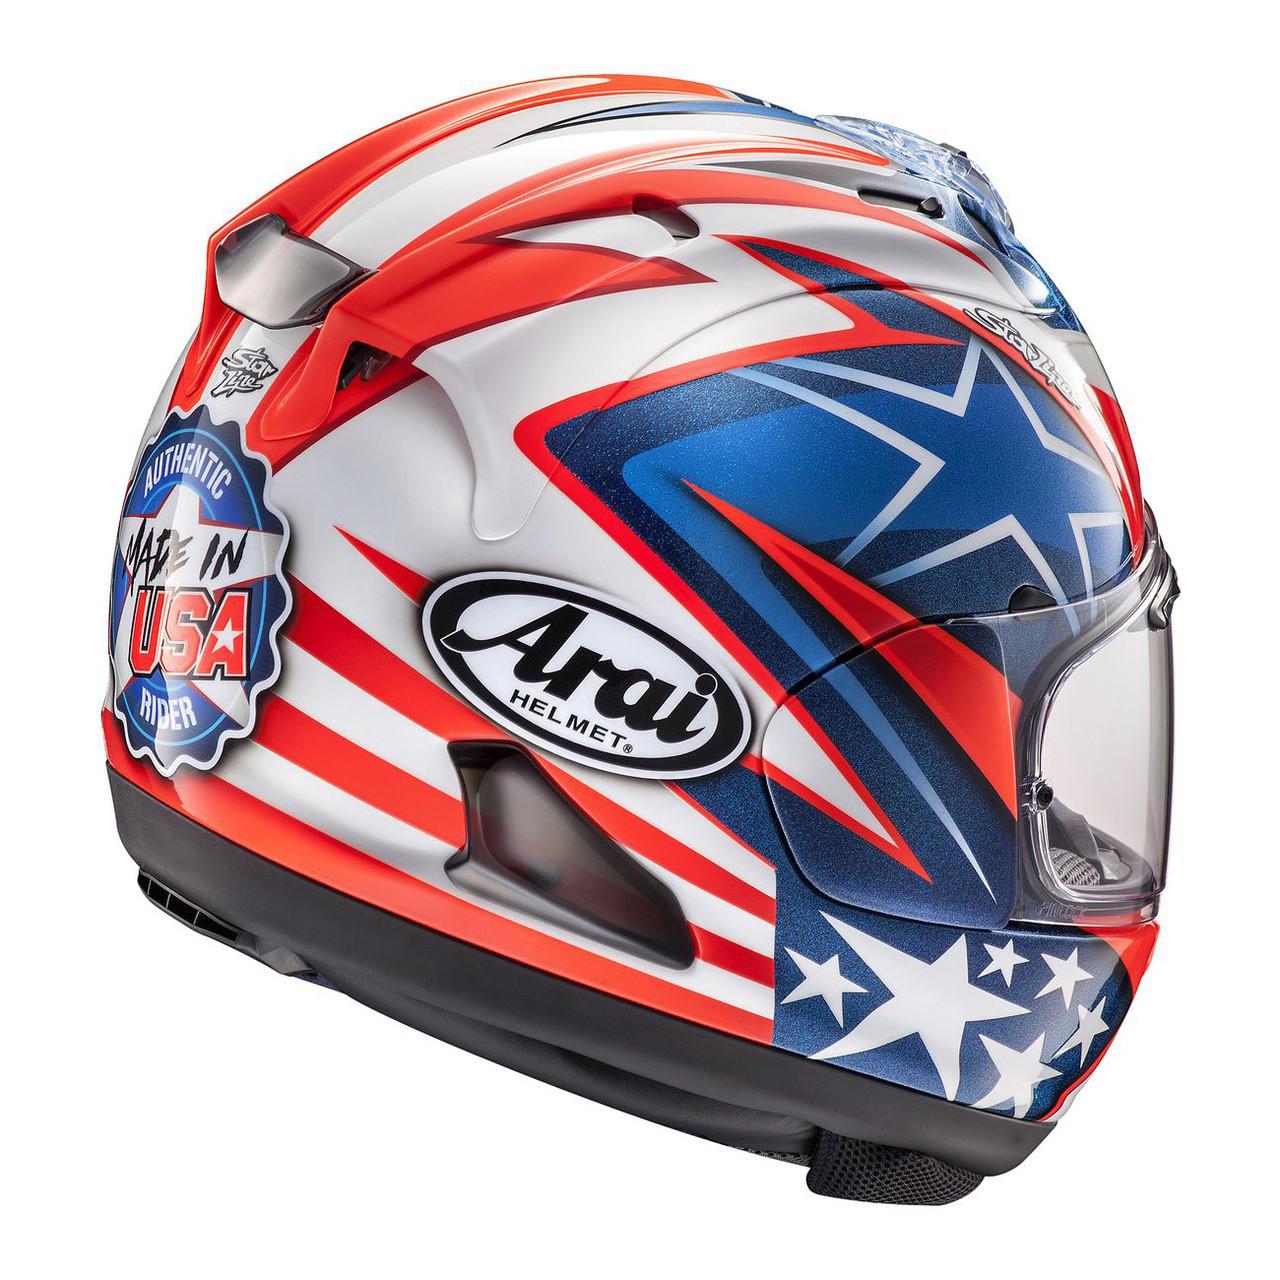 arai corsair x nicky 7 helmet motorcycle house